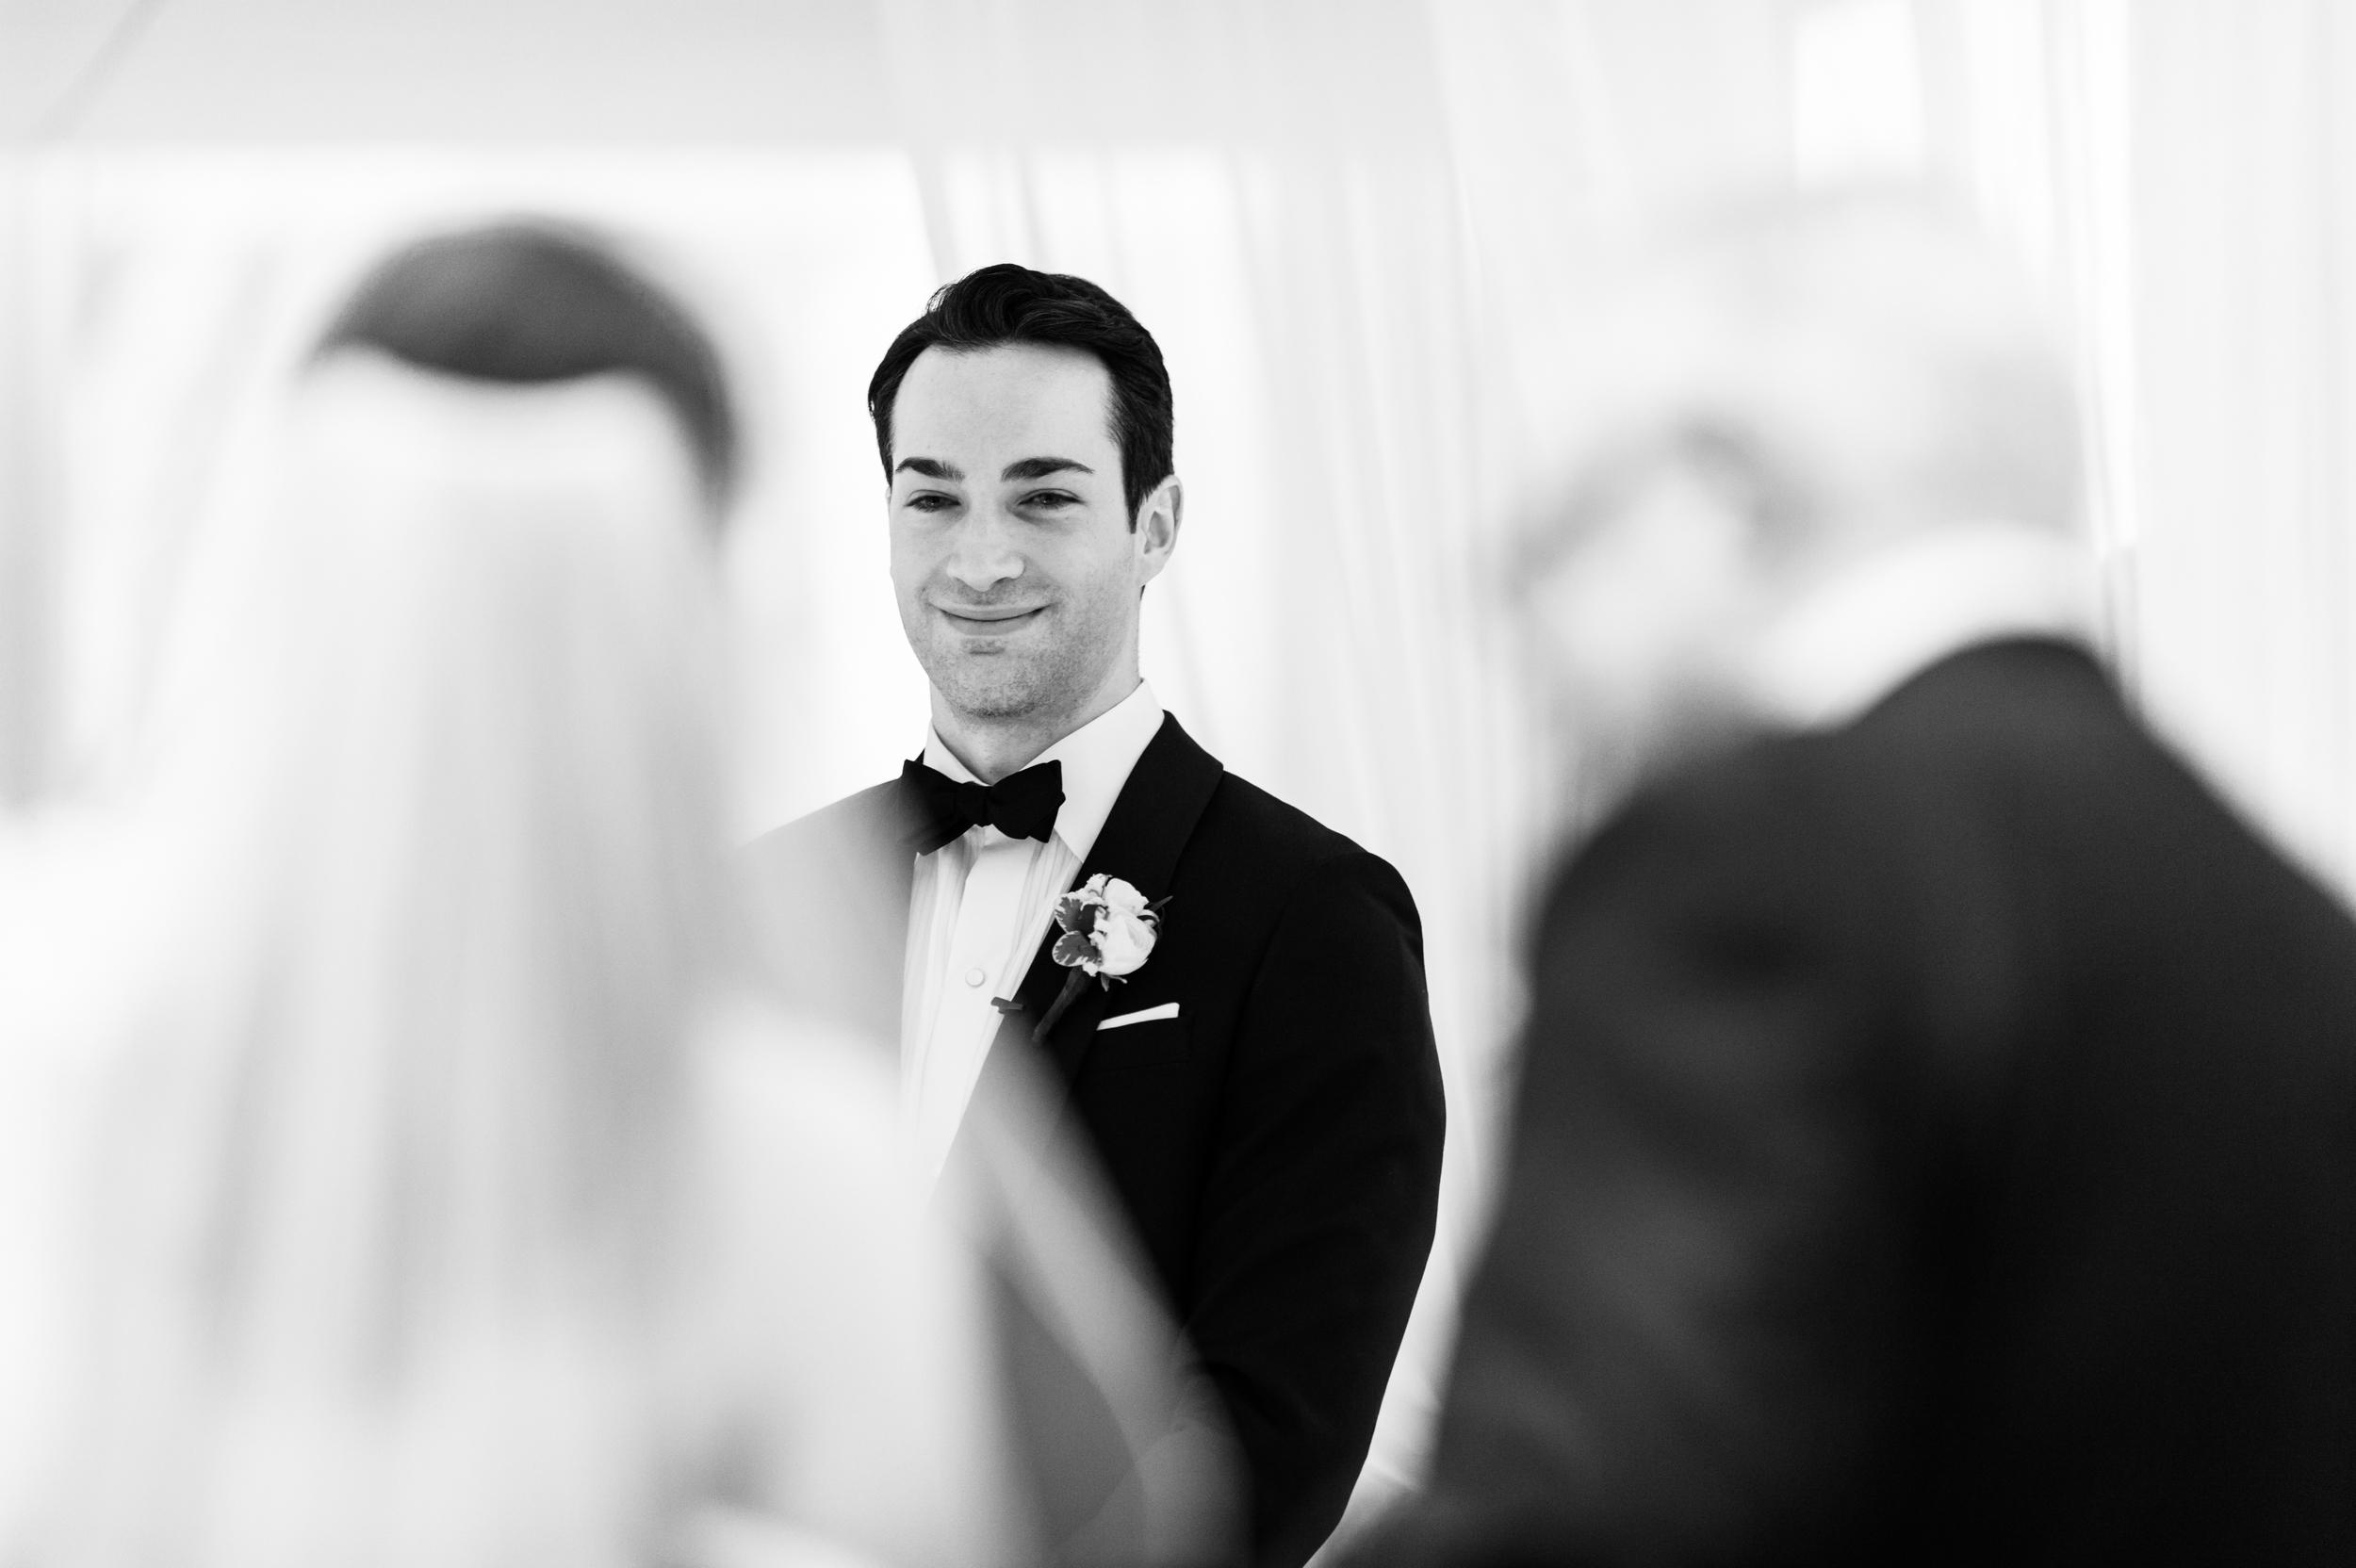 wedding ceremony at the art institute of chicago.jpg